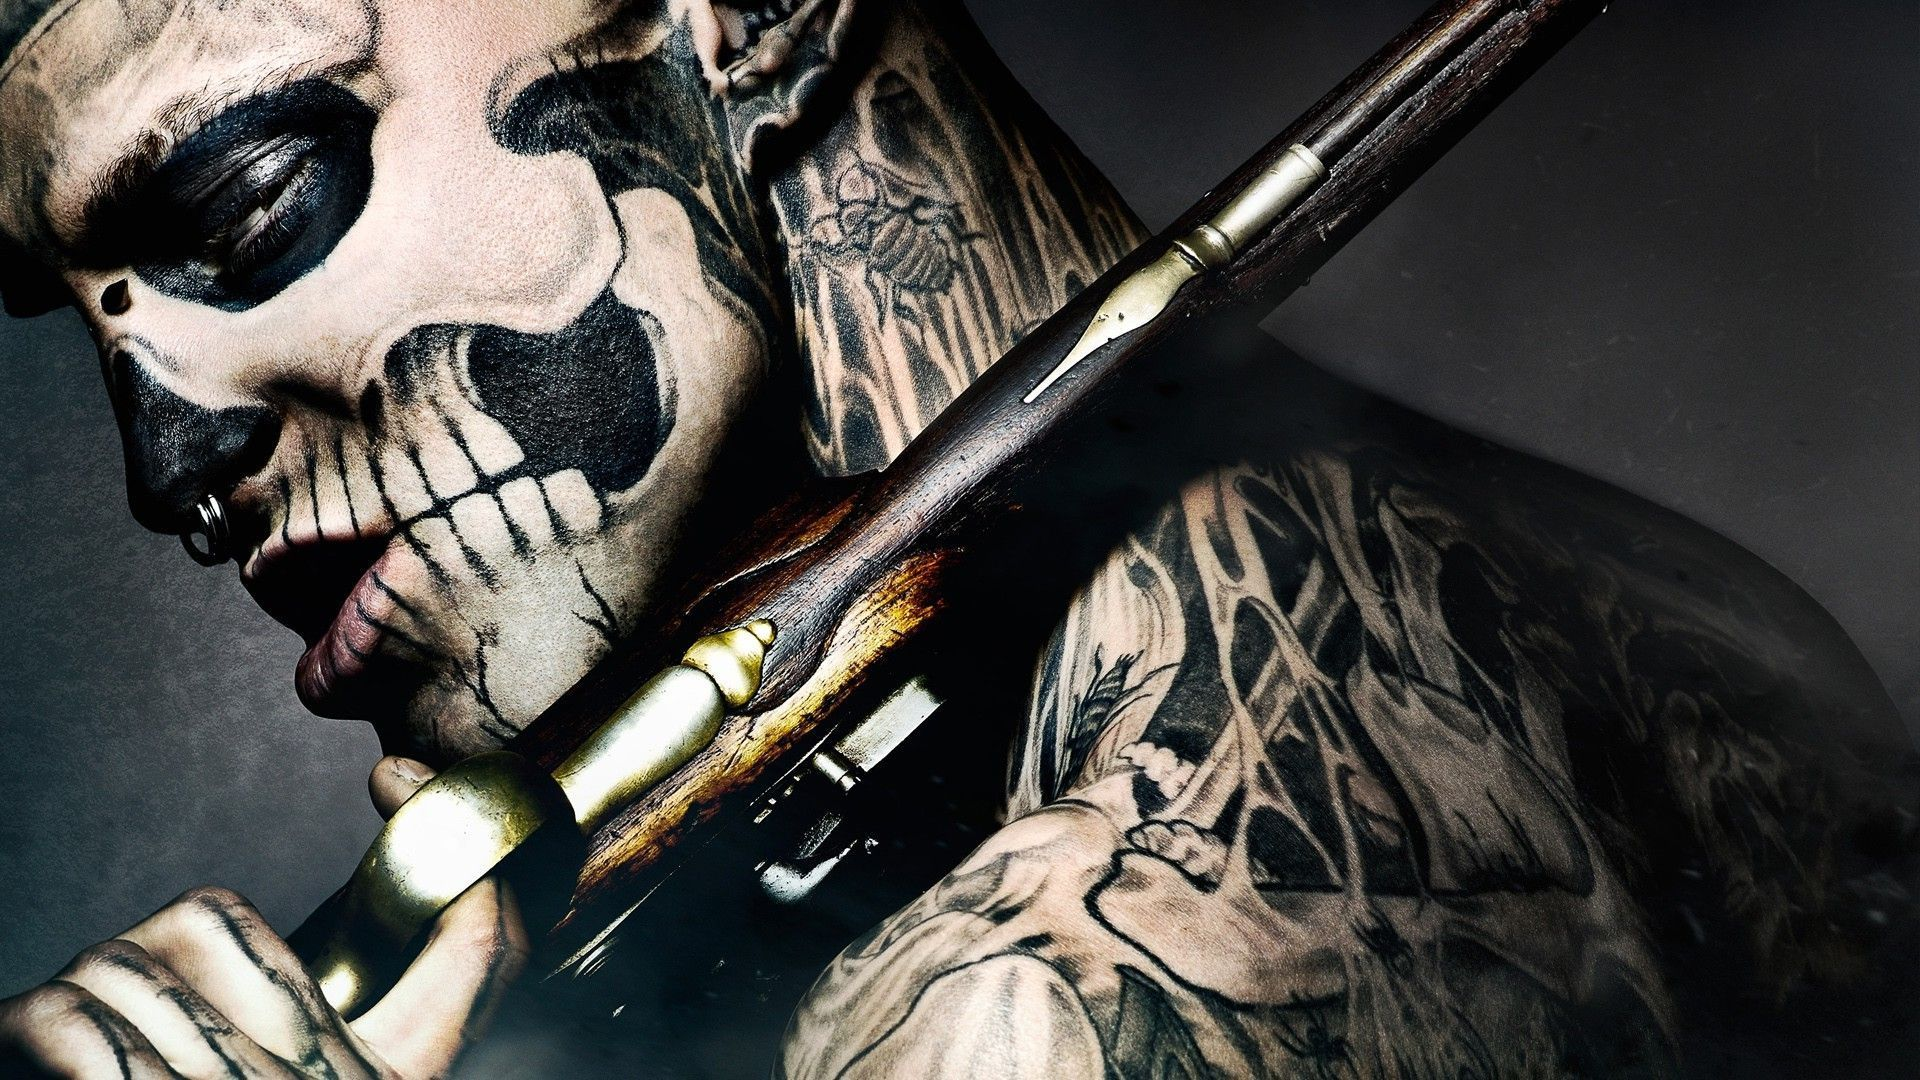 Hd Tattoo Wallpapers Top Free Hd Tattoo Backgrounds Wallpaperaccess